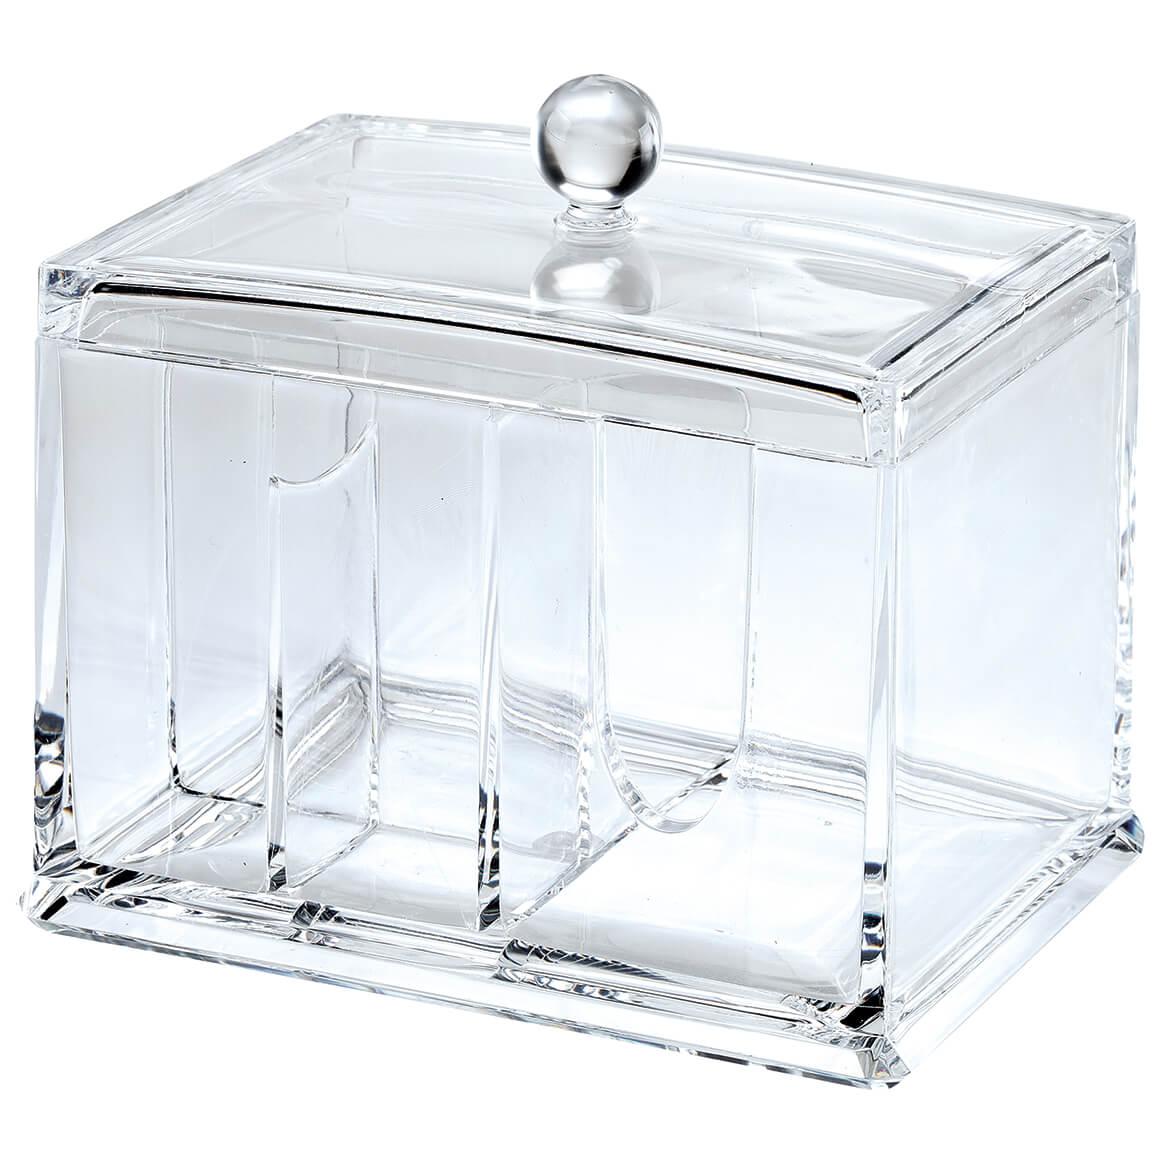 Lidded Acrylic Cosmetic Organizer-370728